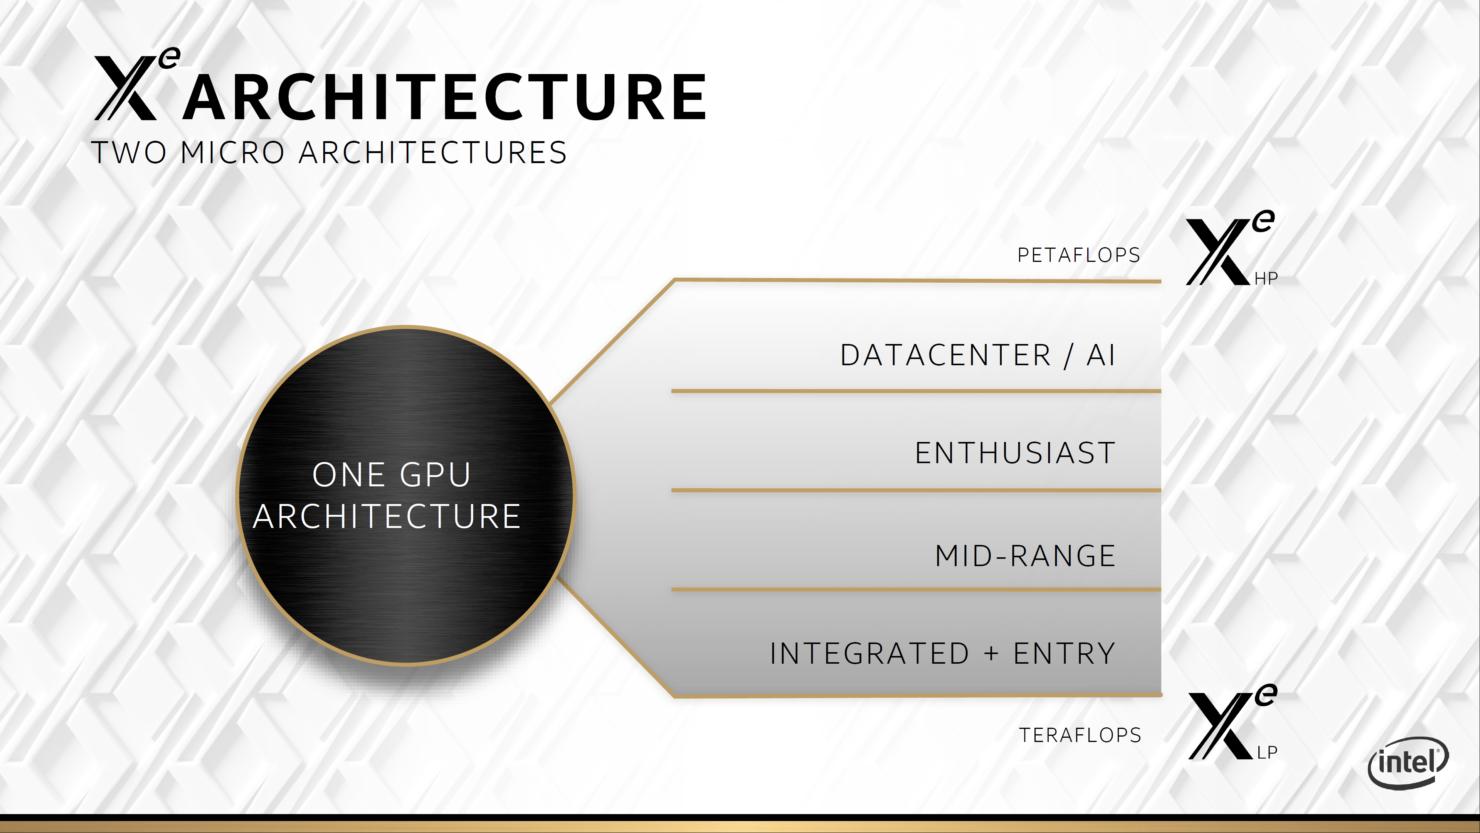 intel-xe-hpc-gpu_ponte-vecchio_architecture_raja-koduri_3